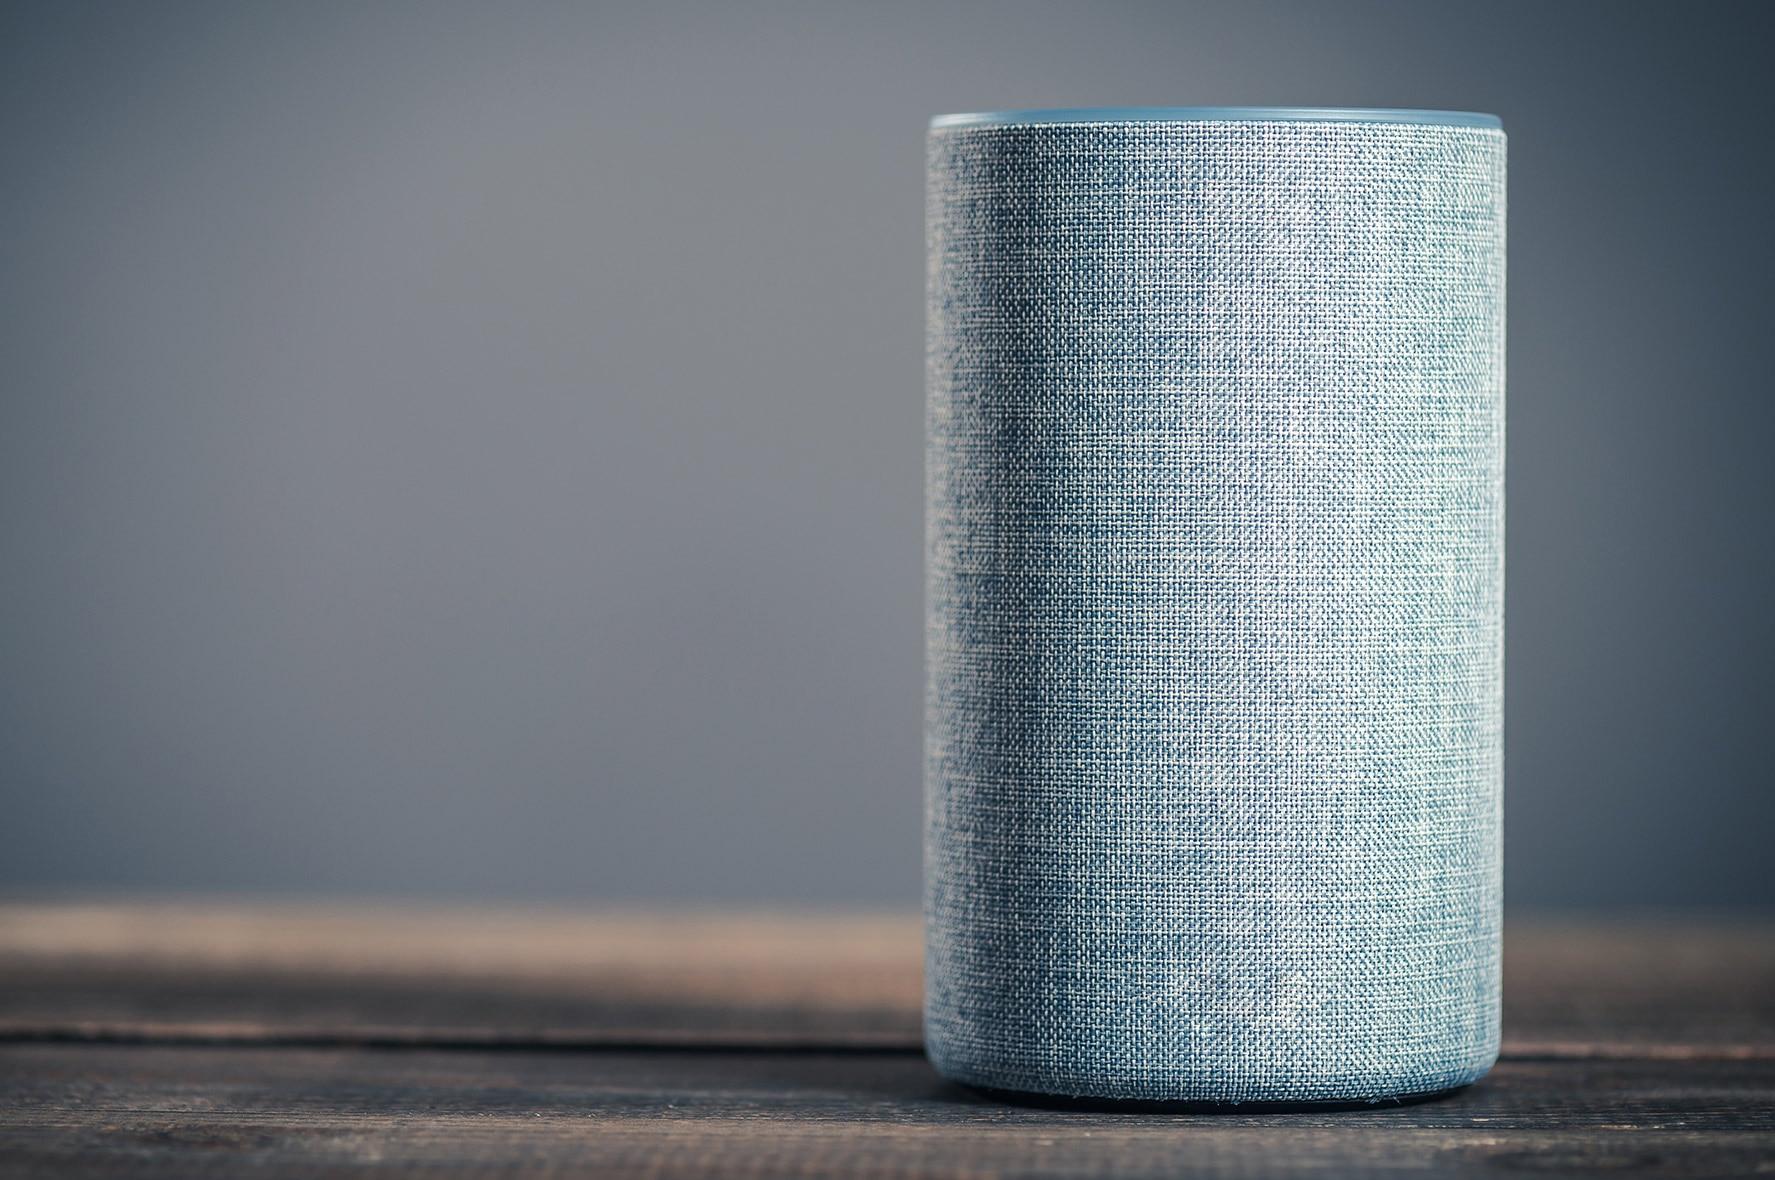 Casas-conectadas-altavoz-inteligente-asistente-virtual-smart-home-bbva